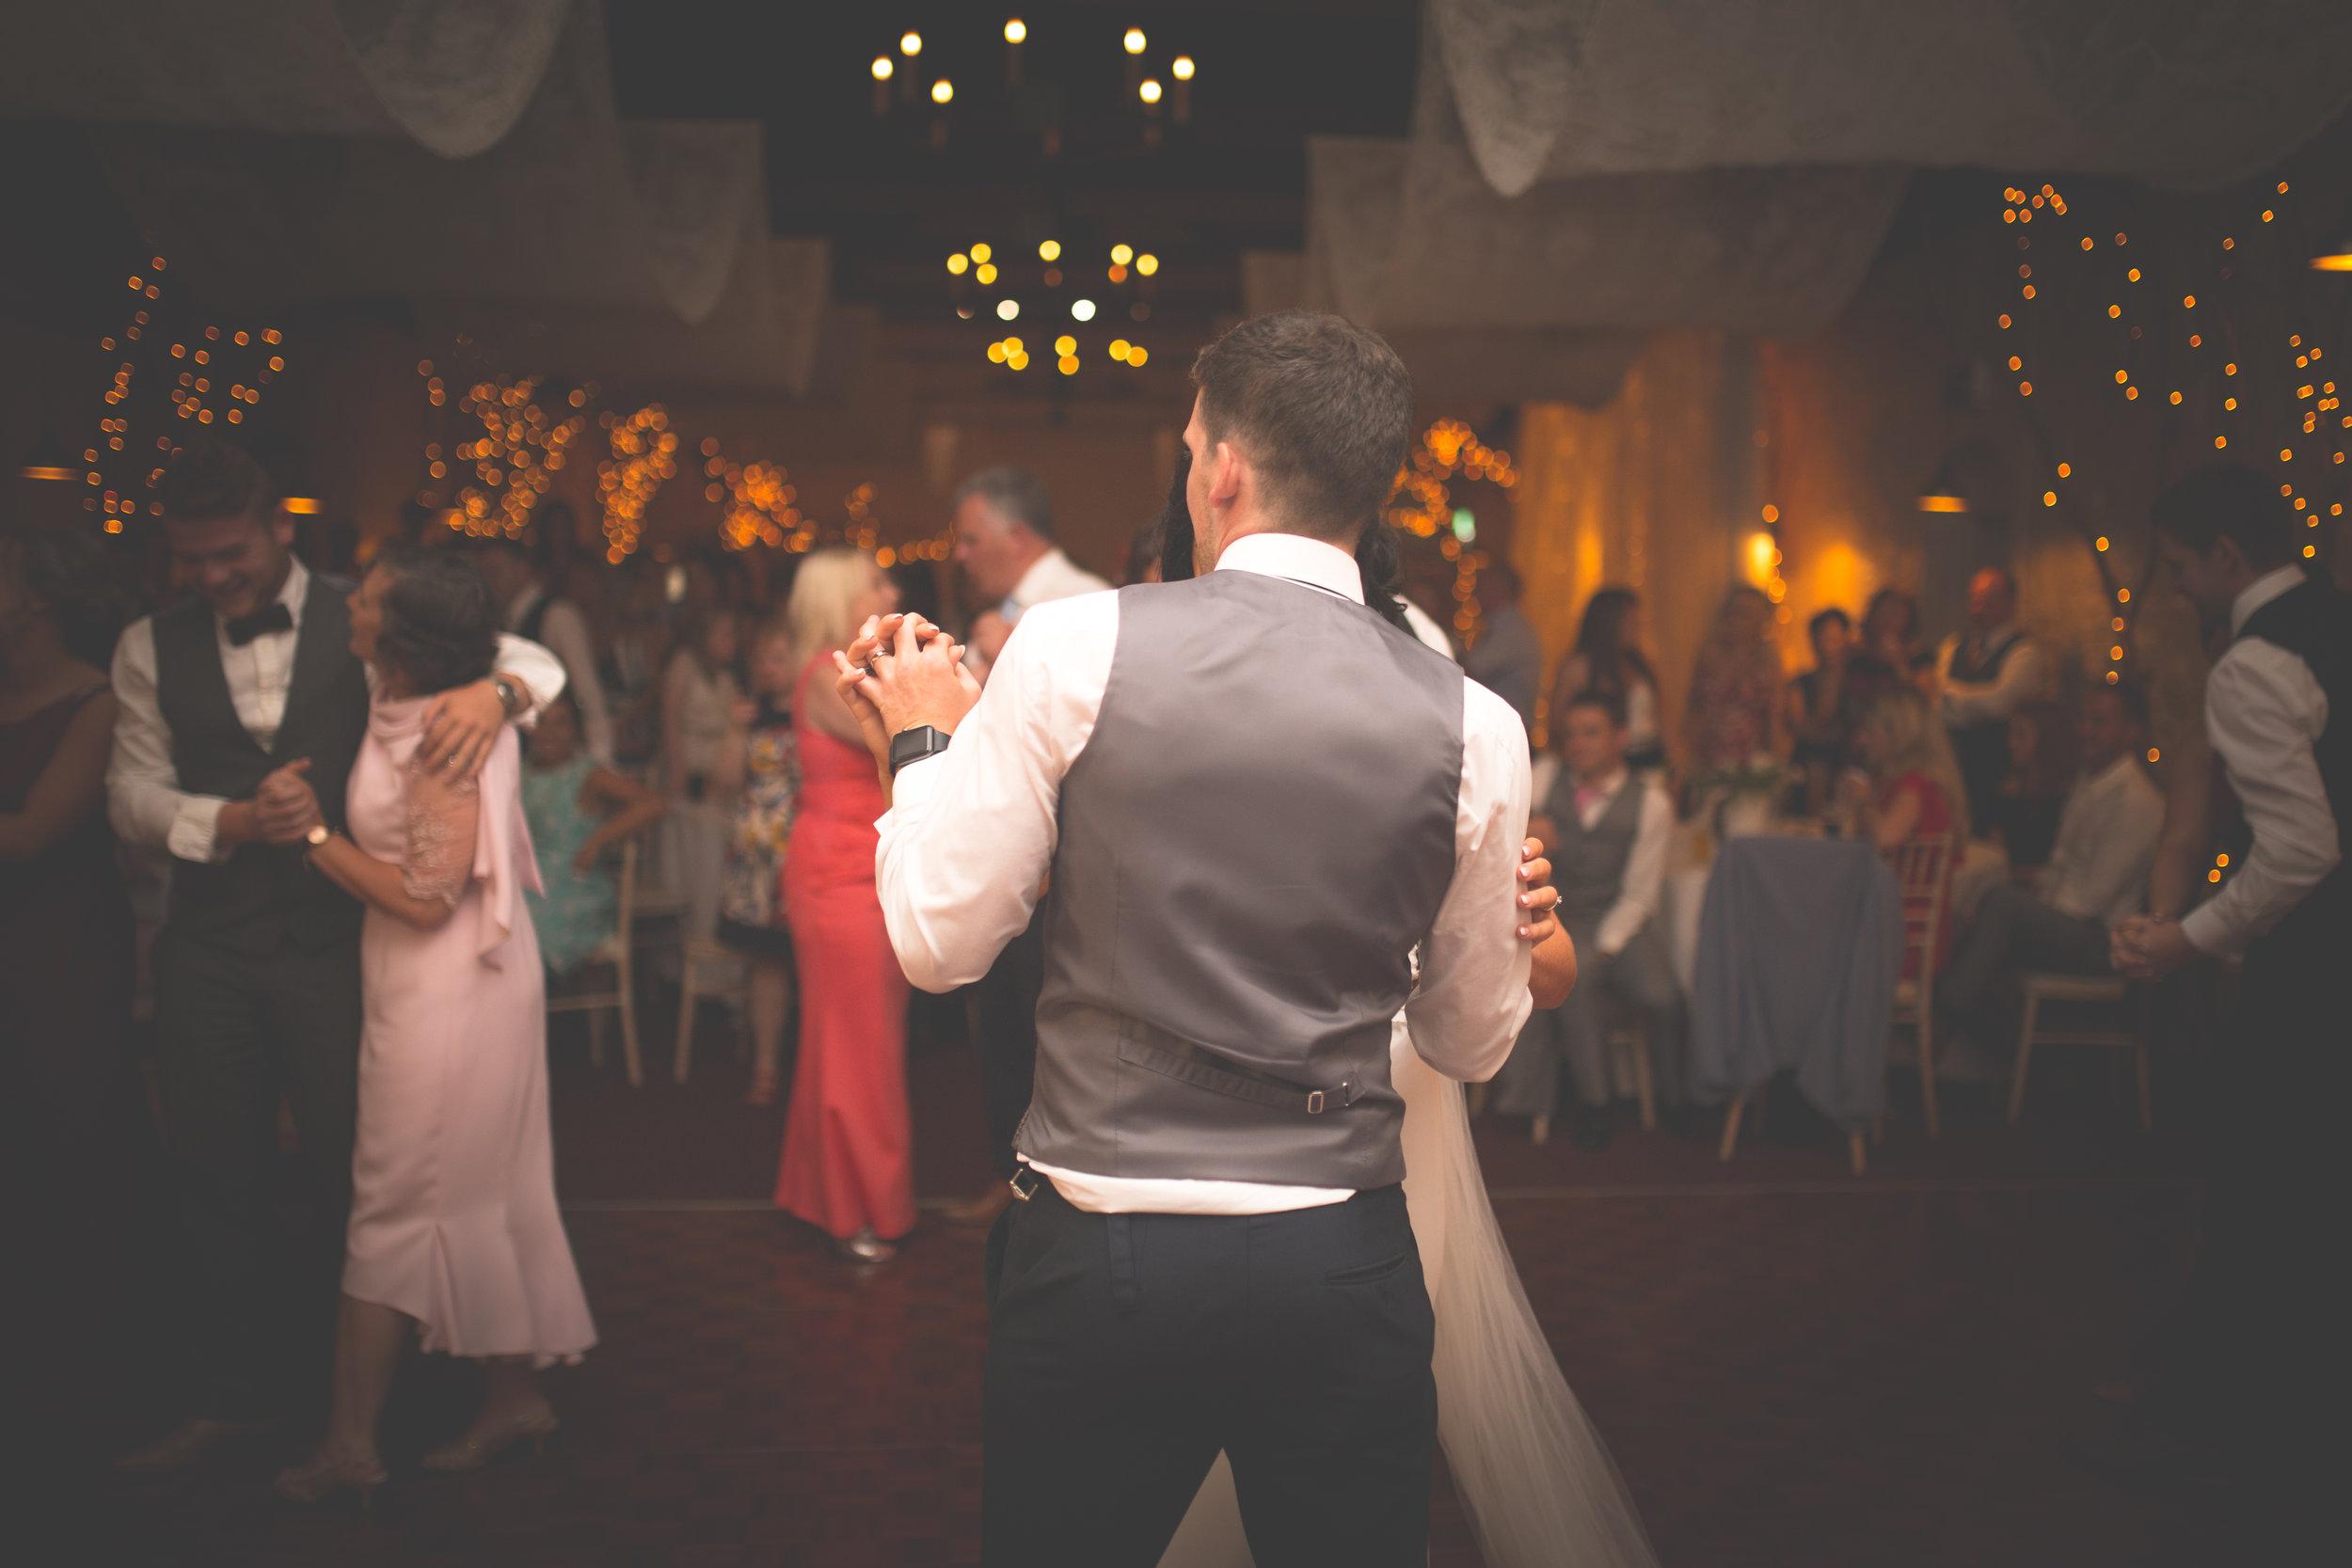 Brian McEwan Wedding Photography | Carol-Annee & Sean | The Dancing-47.jpg